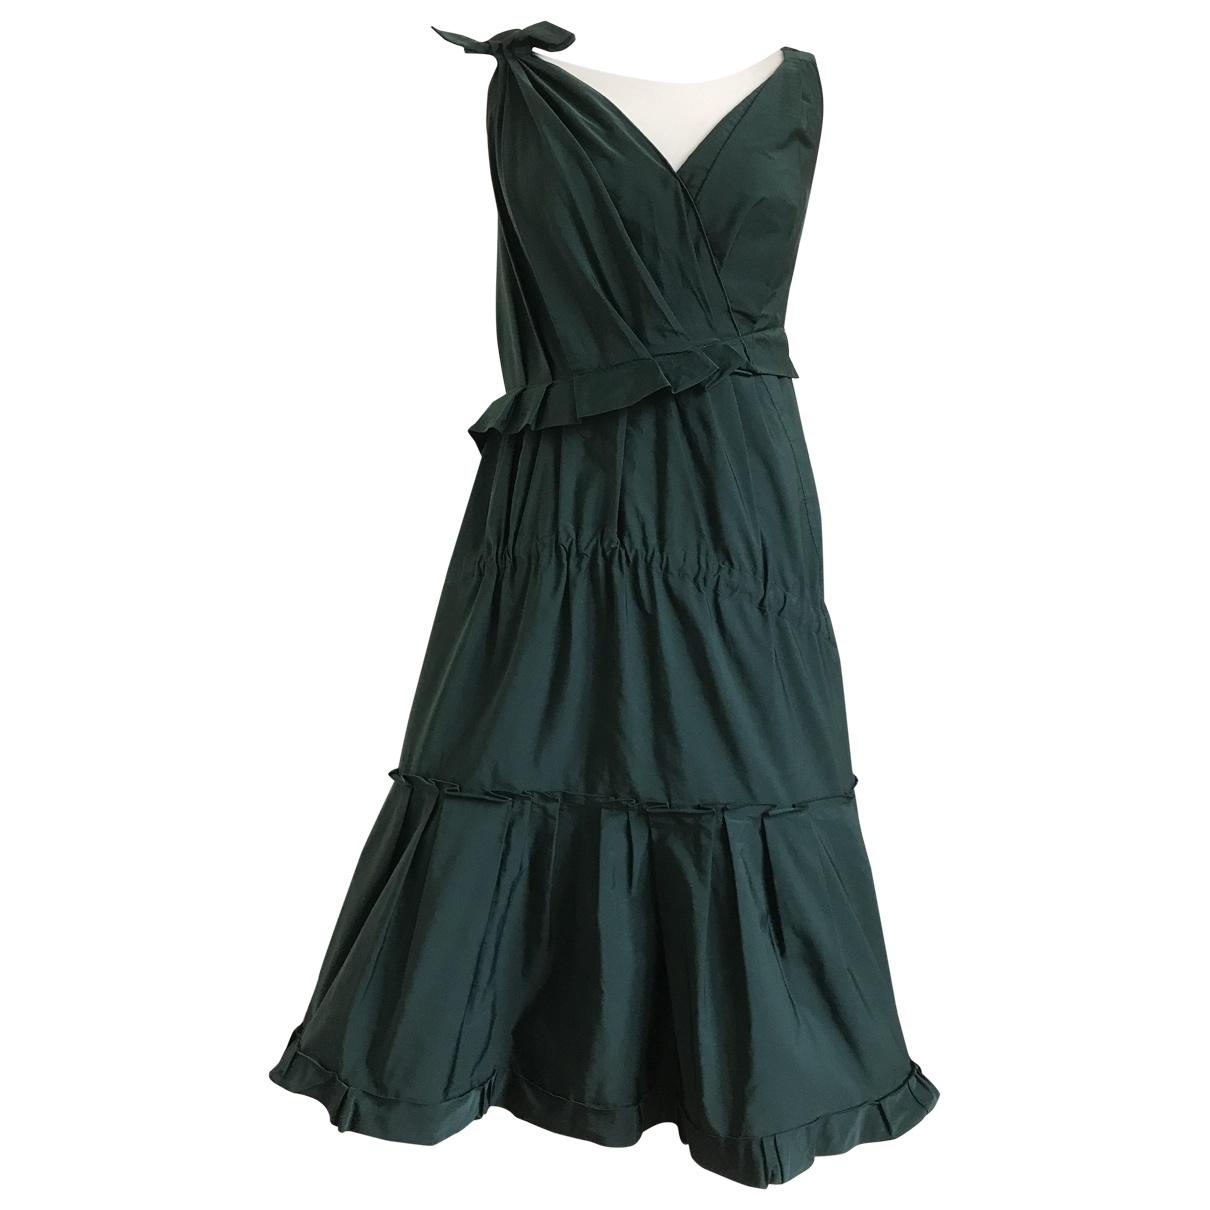 Nina Ricci \N Kleid in  Gruen Polyester